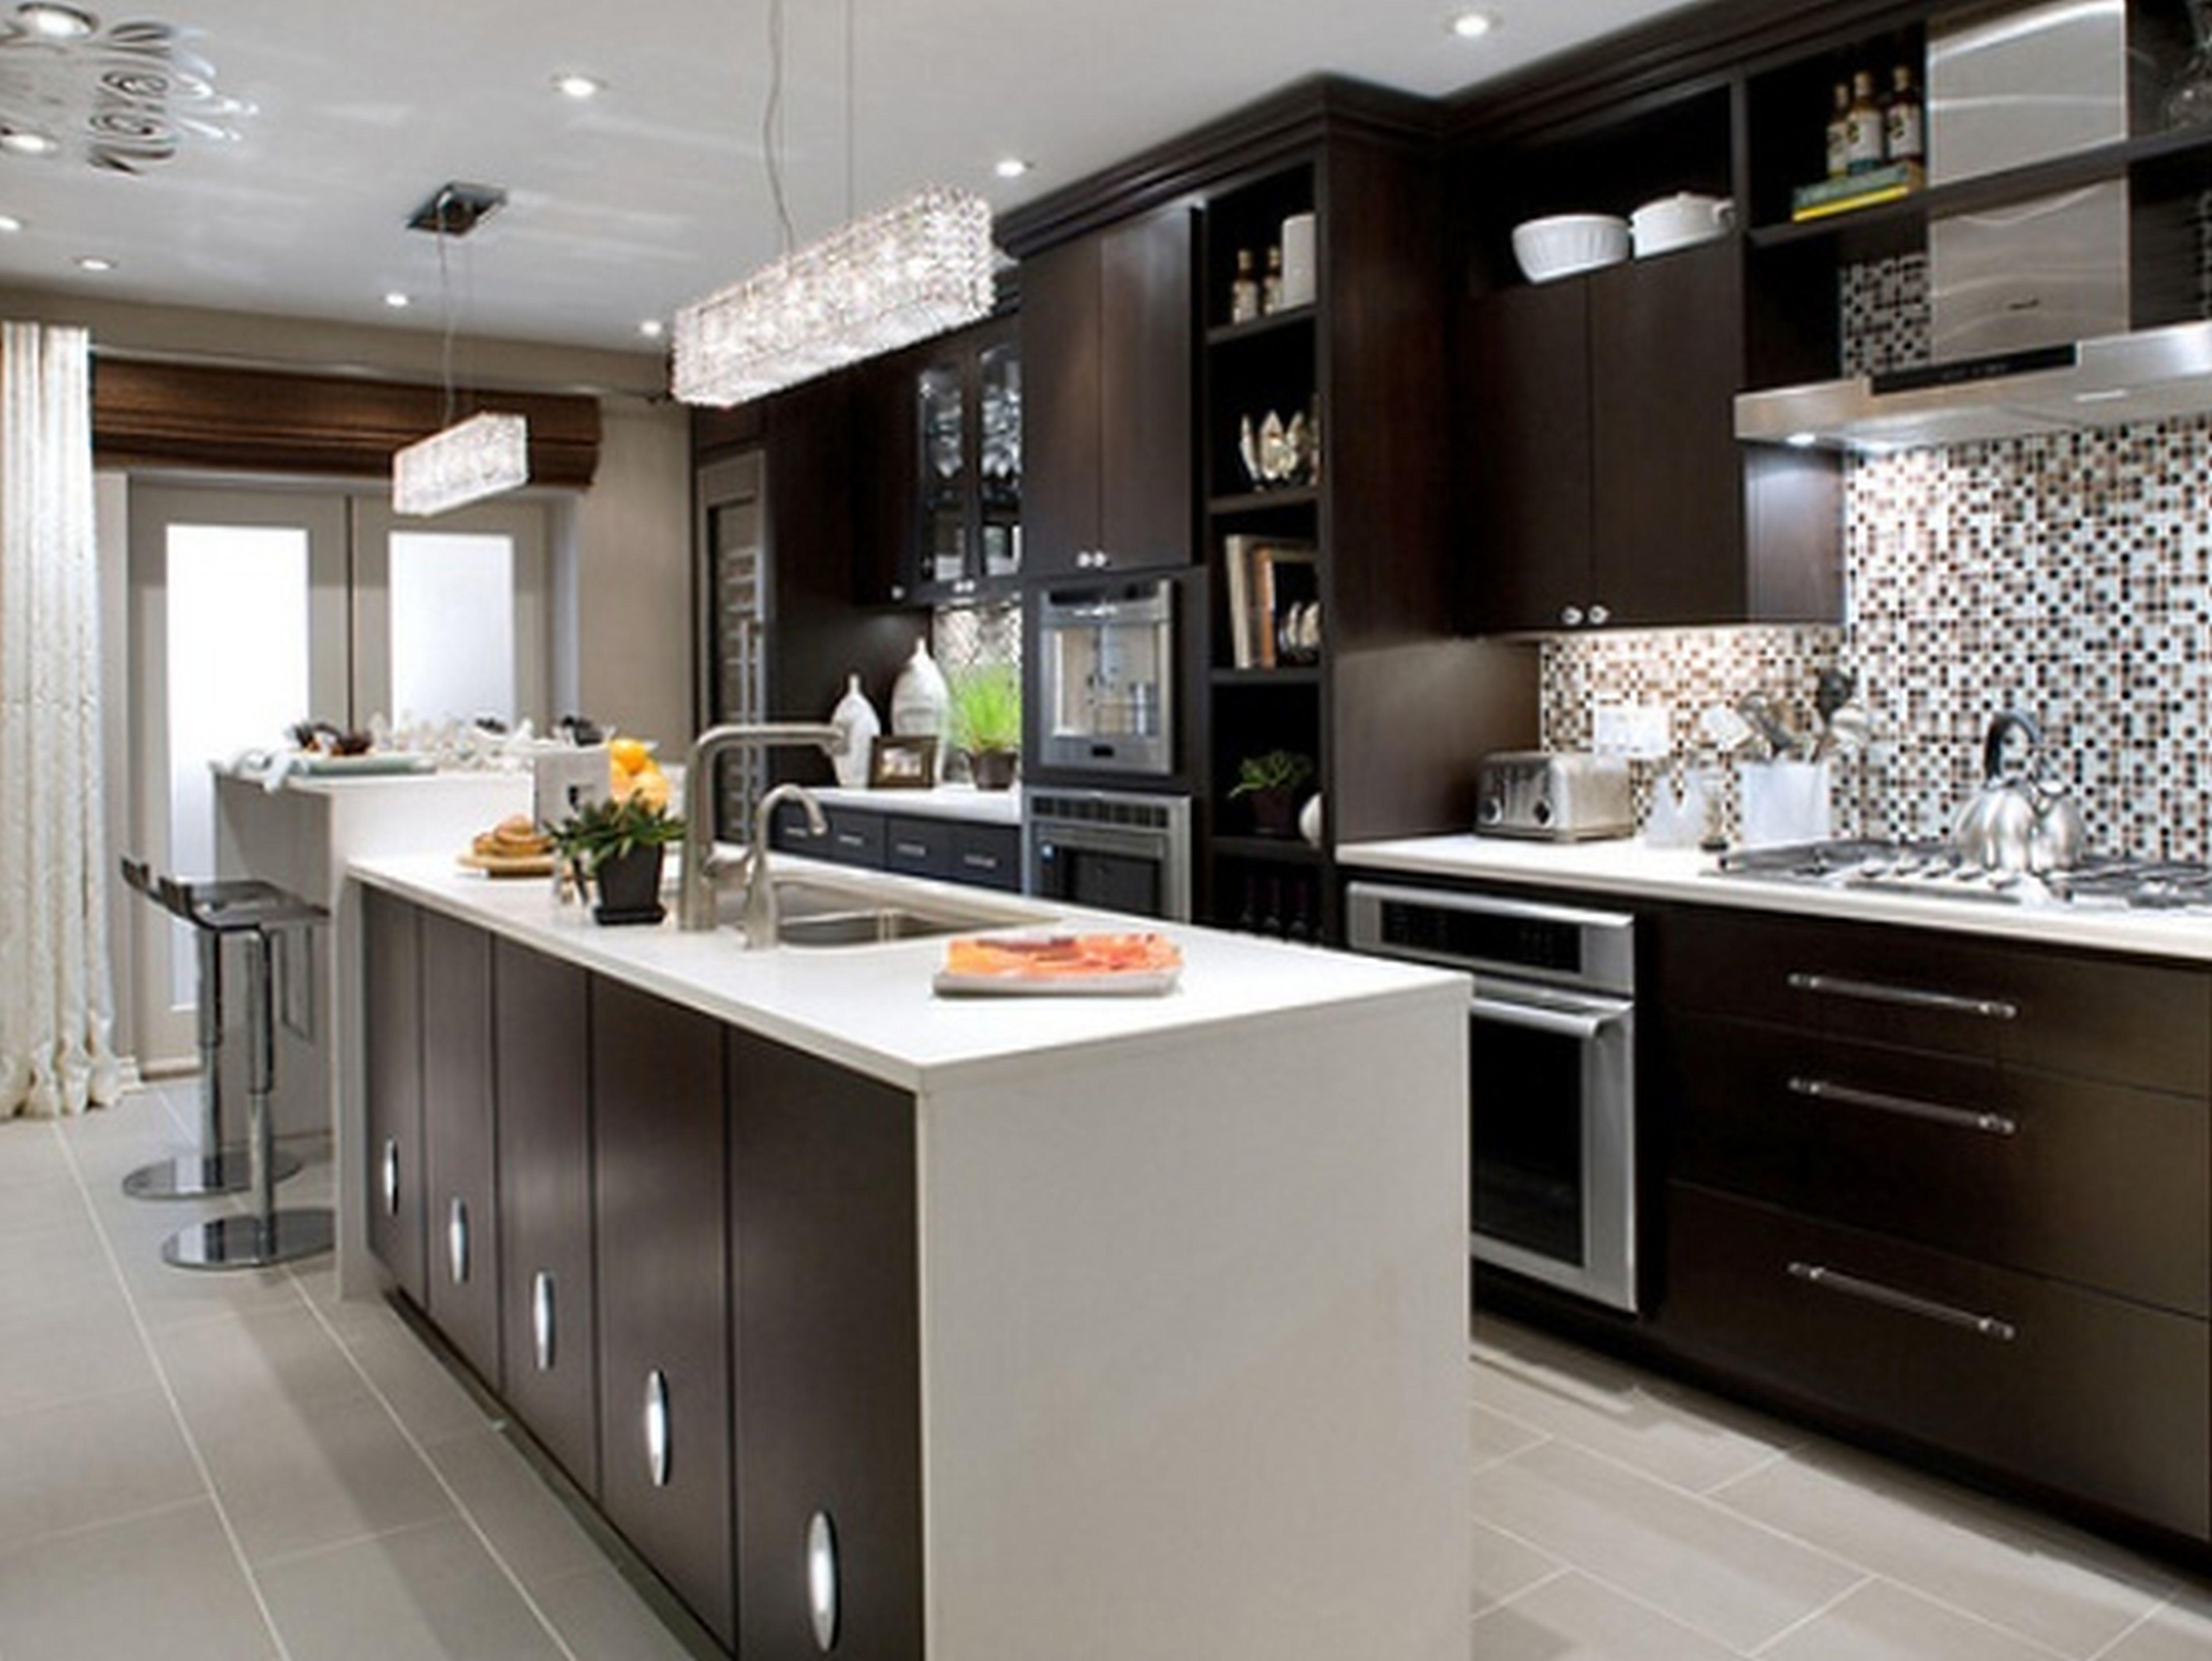 3d Wallpaper Ideas Modern Decorating Ideas For Kitchens Modern Kitchen Design